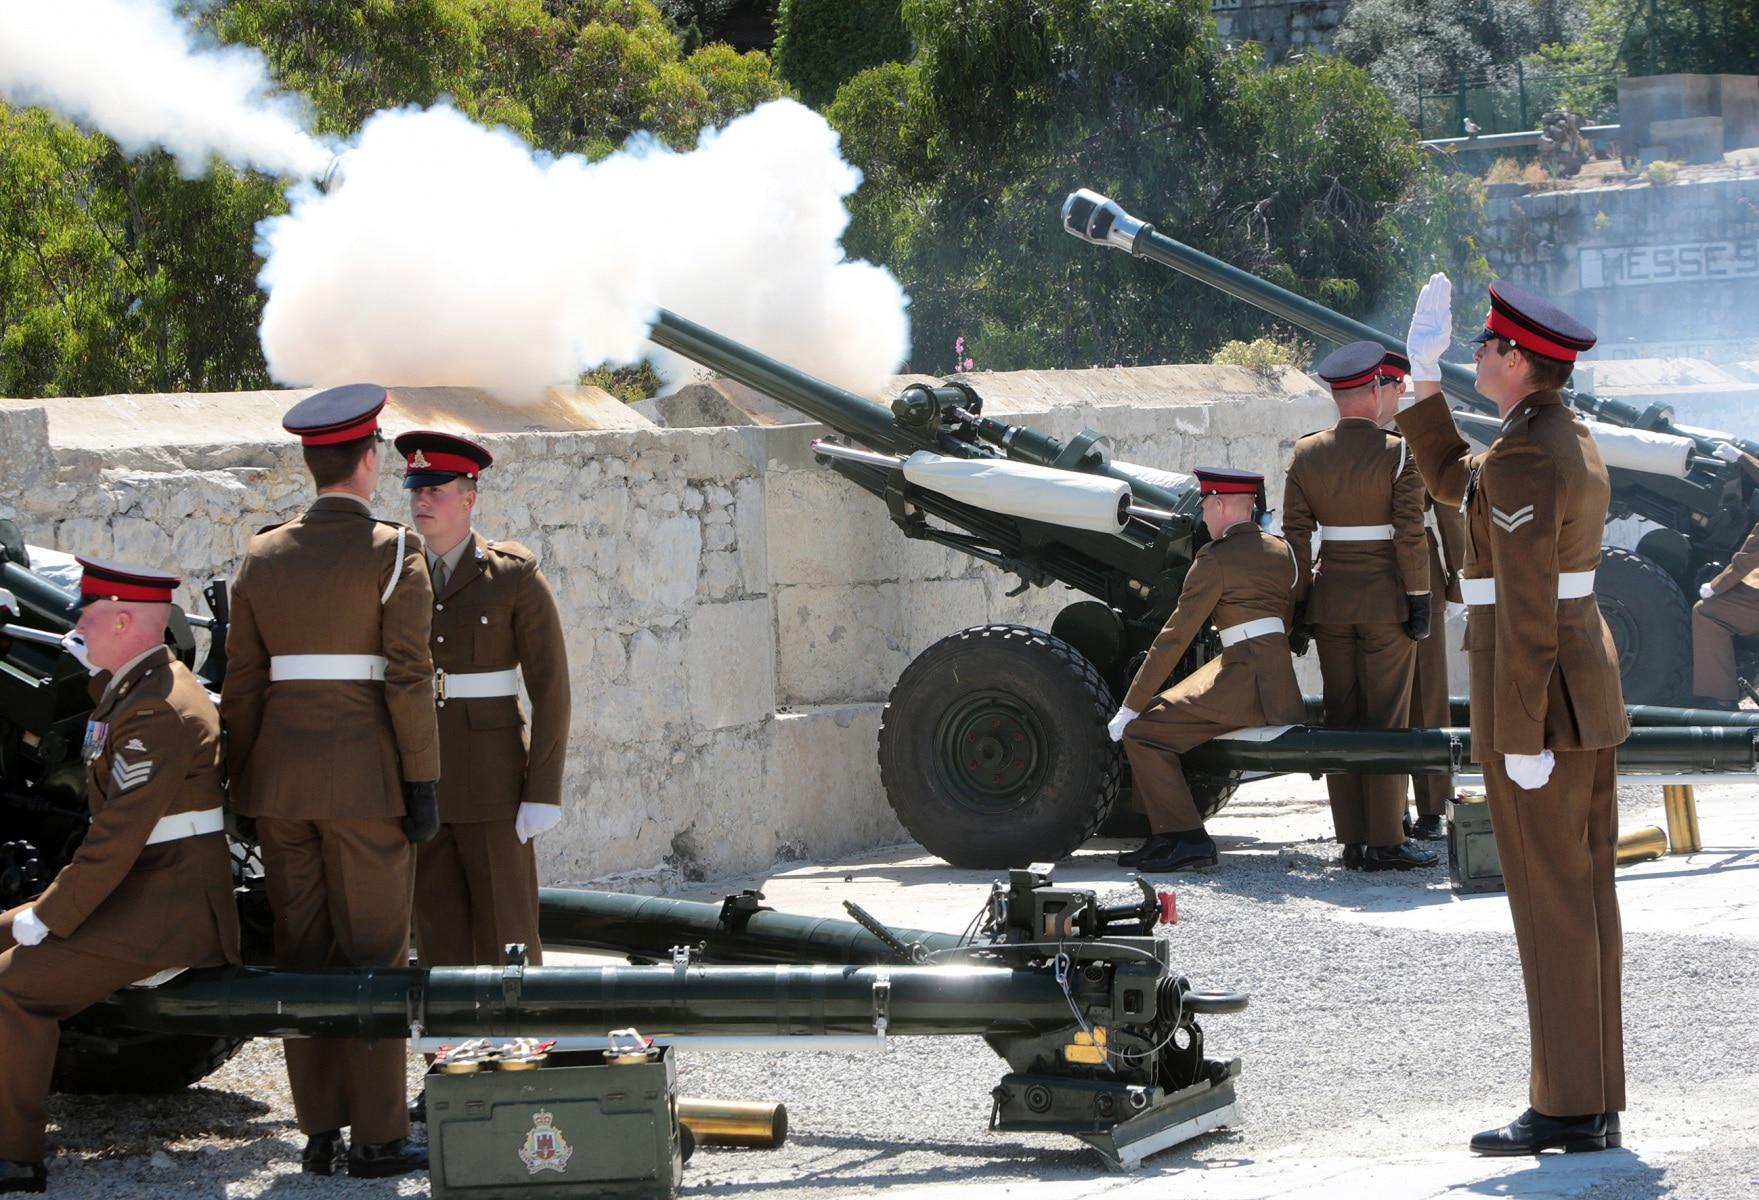 2-jun-2016-salvas-en-gibraltar-honor-al-aniversario-de-coronacin-de-la-reina_27417180285_o